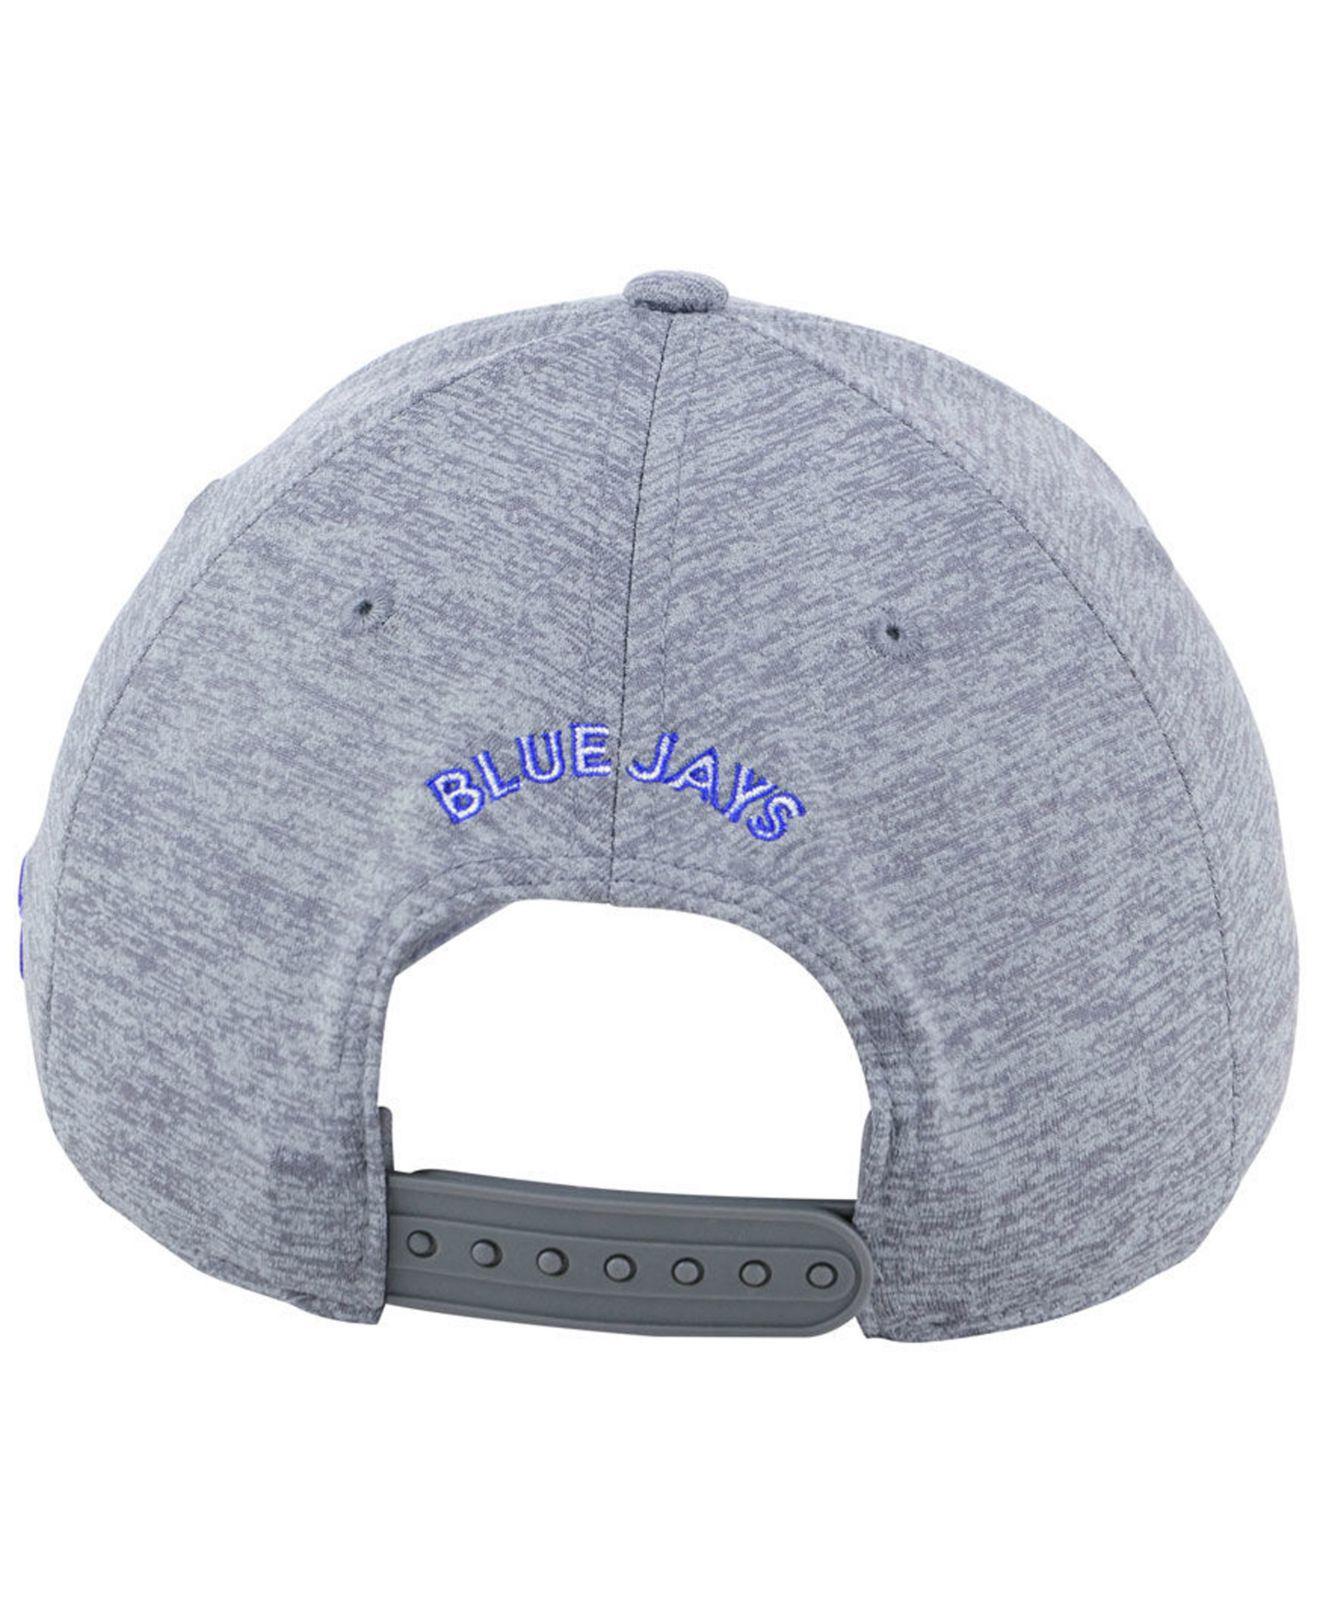 brand new 69ed8 9967b ... ebay lyst under armour toronto blue jays twist closer cap in blue for  men a039a 03d1d